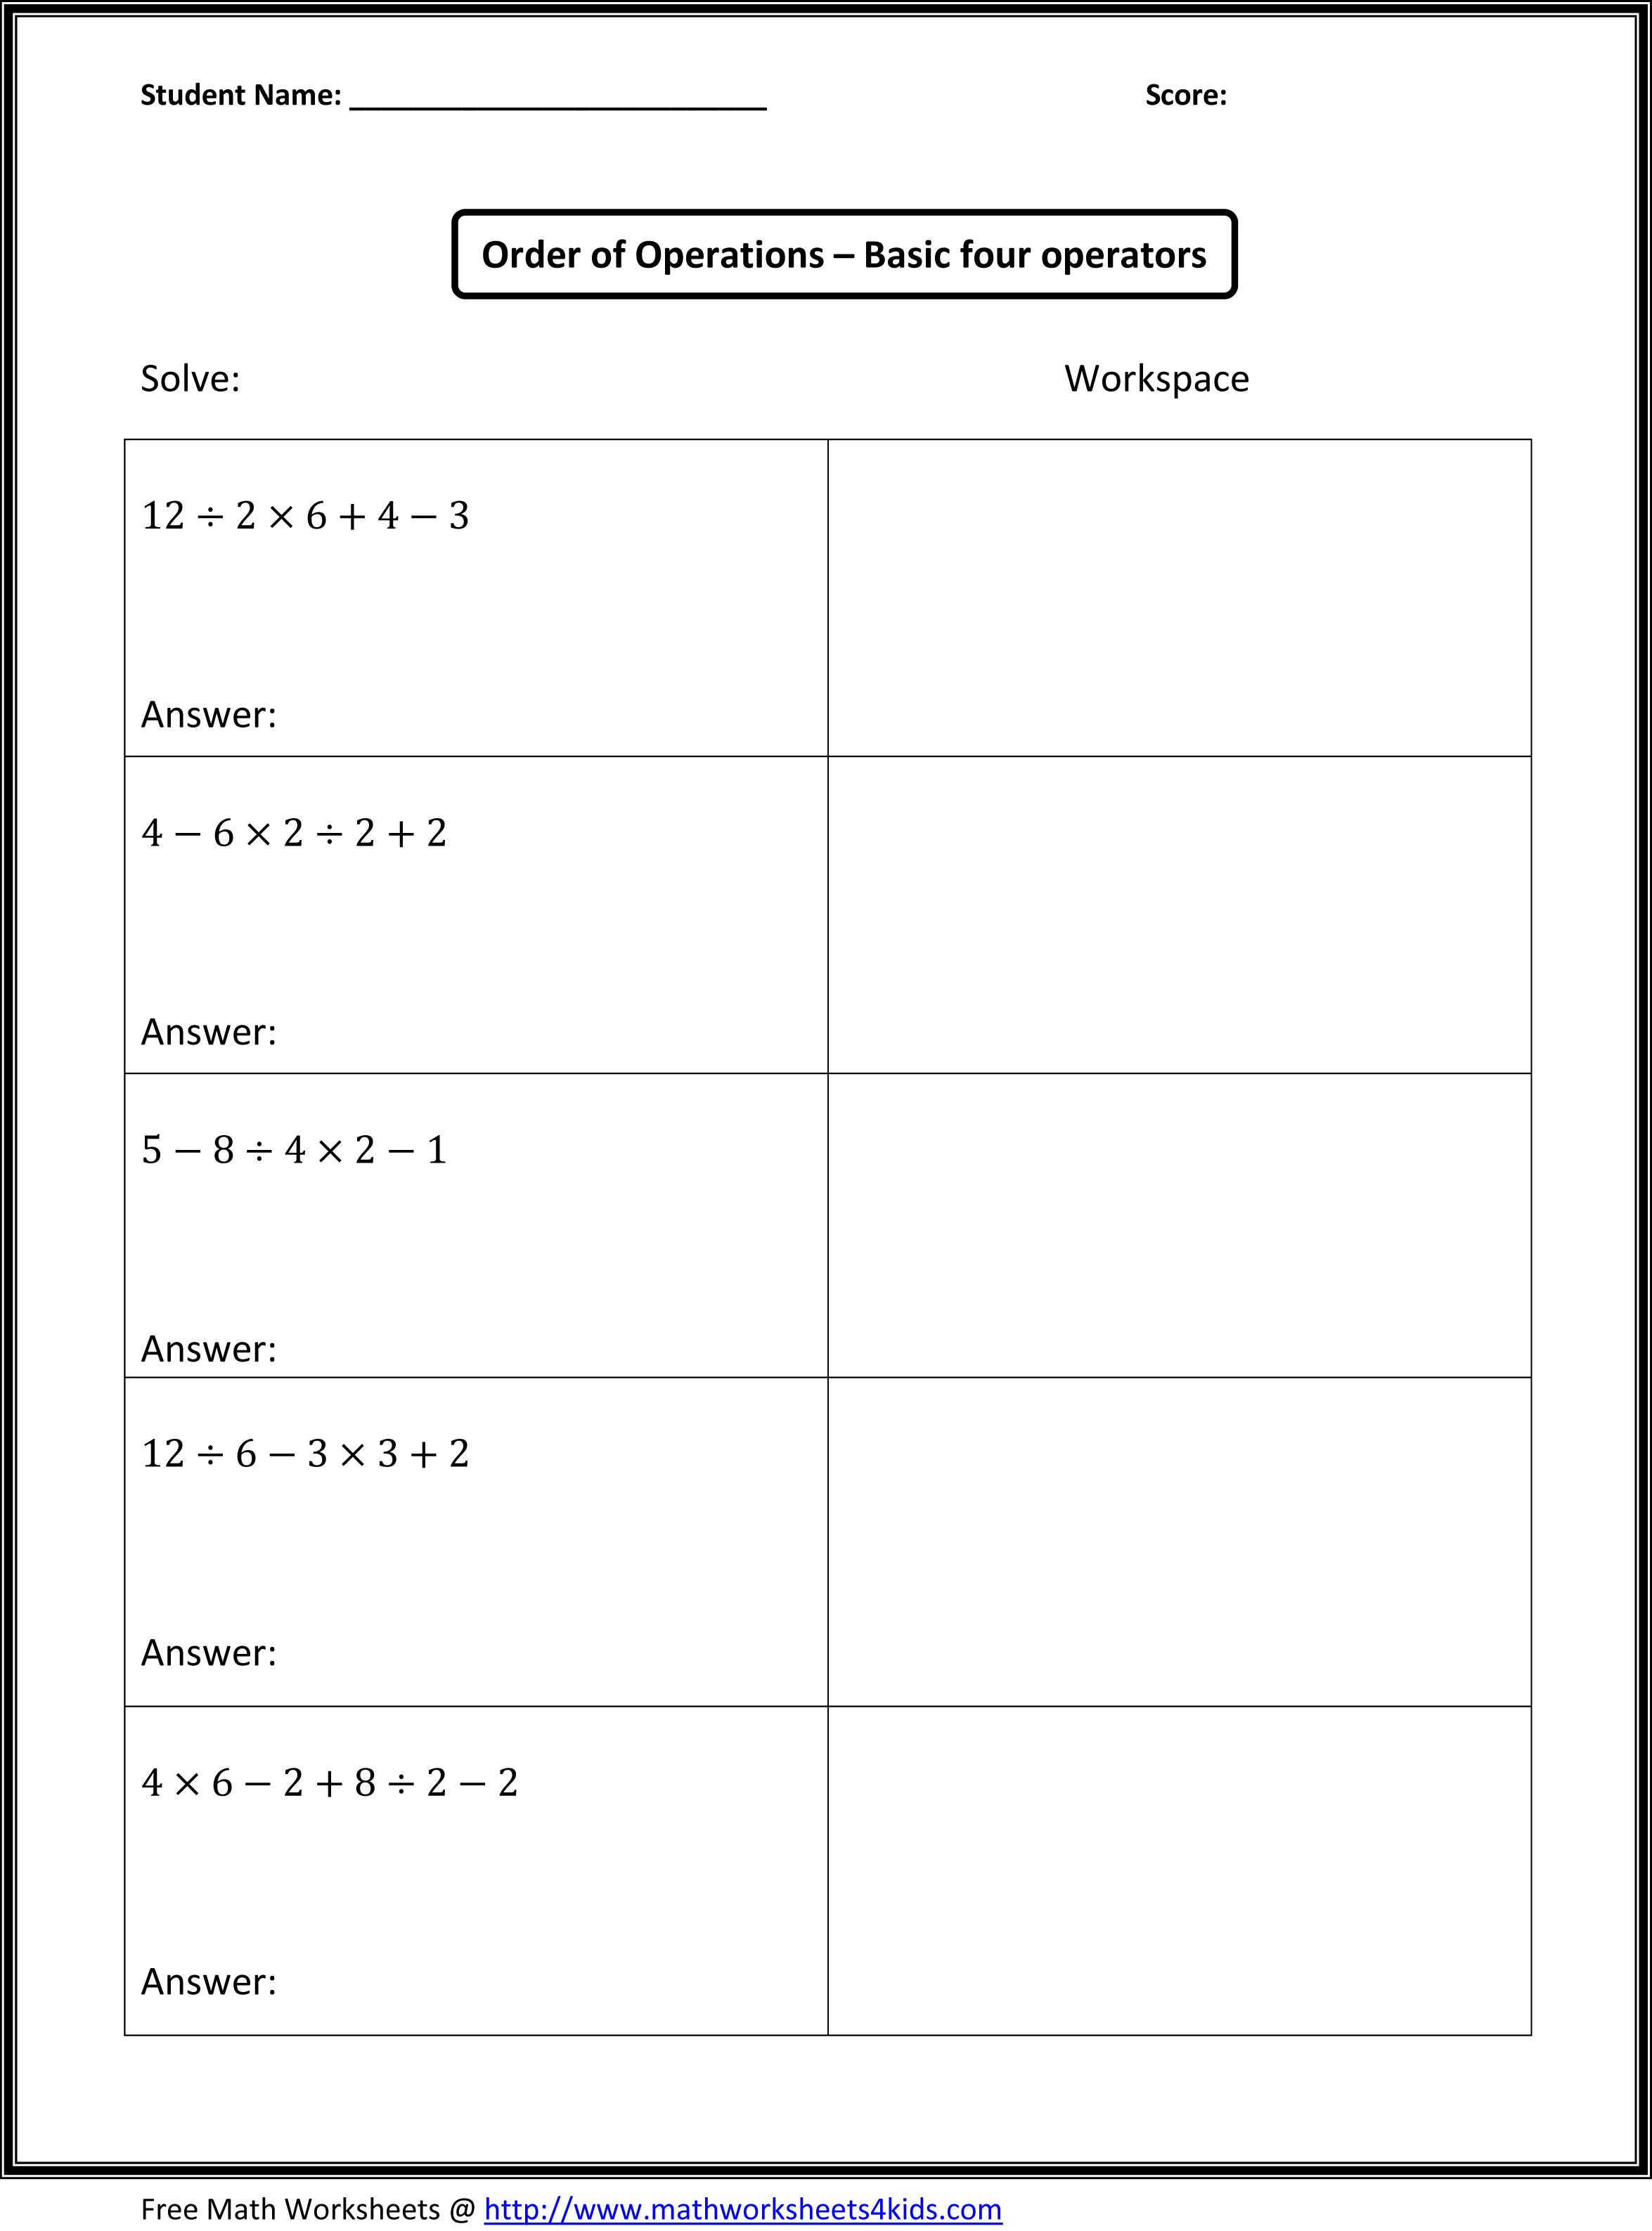 Algebra Worksheets For 4th Grade Printable